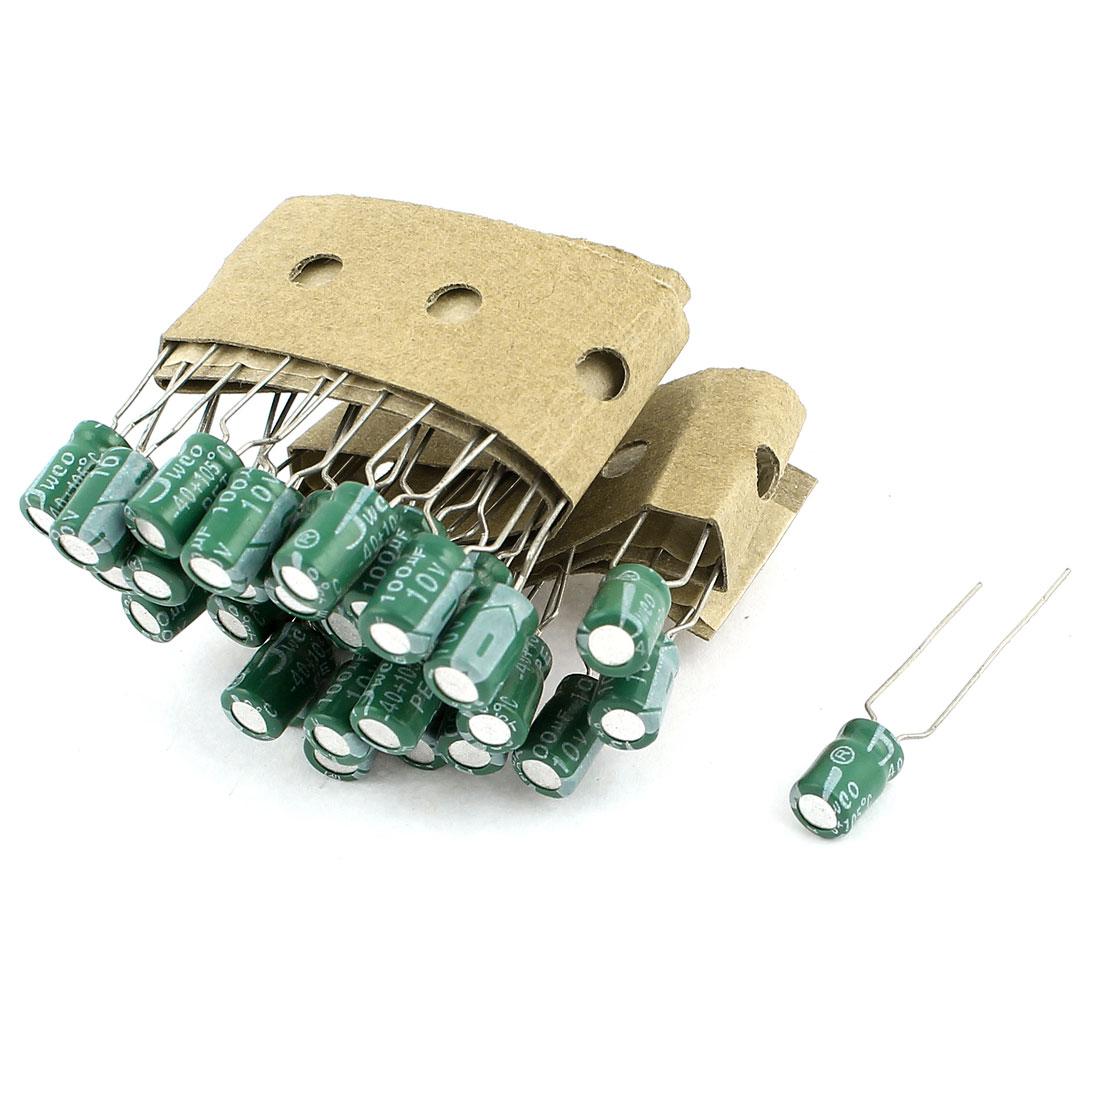 30PCS 100uF 10V 5x8mm Through Hole Radial Lead Aluminium Electrolytic Capacitor